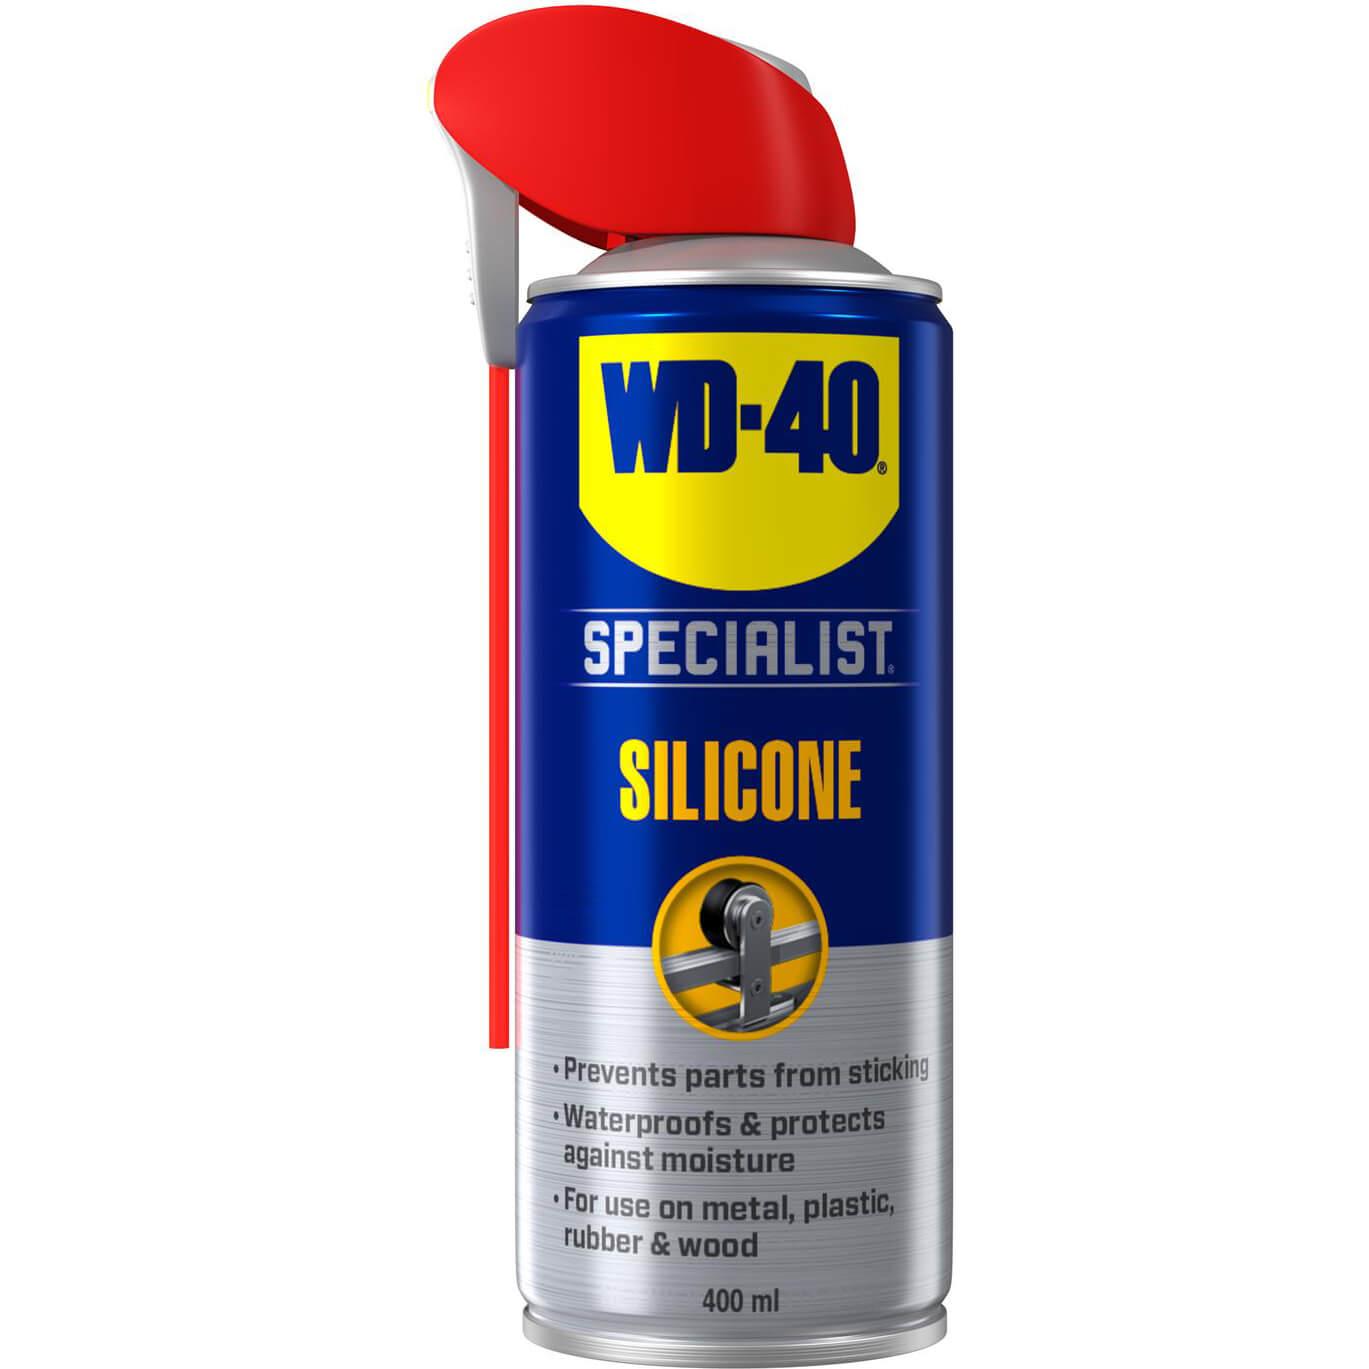 Image of WD40 Specialist Silicone Lubricant Aerosol Spray 400ml